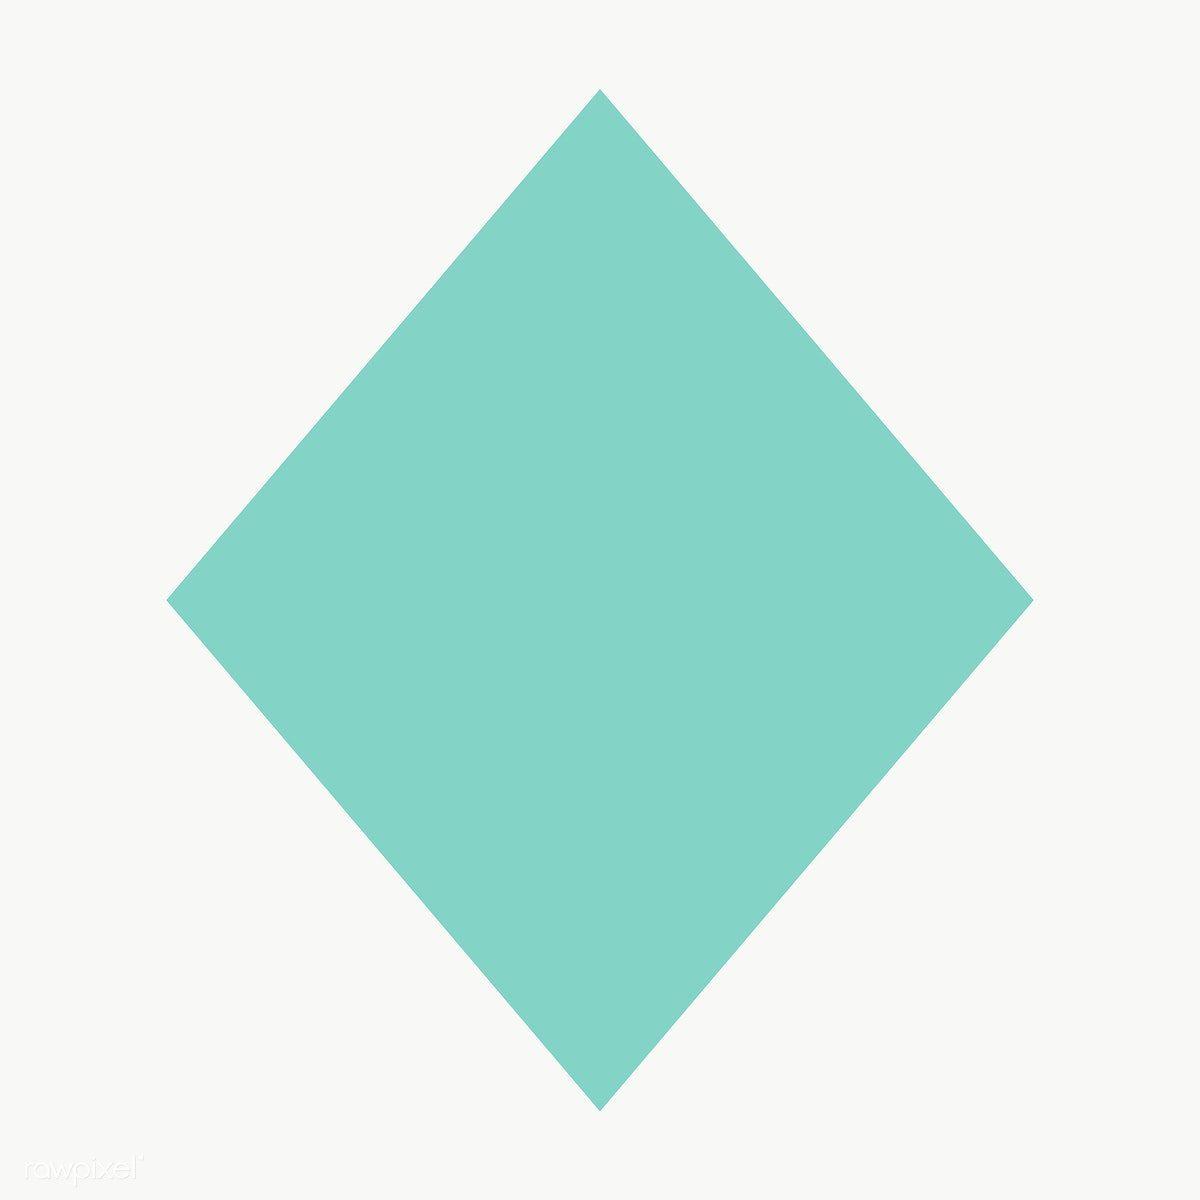 Green Rhombus Geometric Shape Transparent Png Free Image By Rawpixel Com Ningzk V Geometric Shapes Geometric Printable Designs